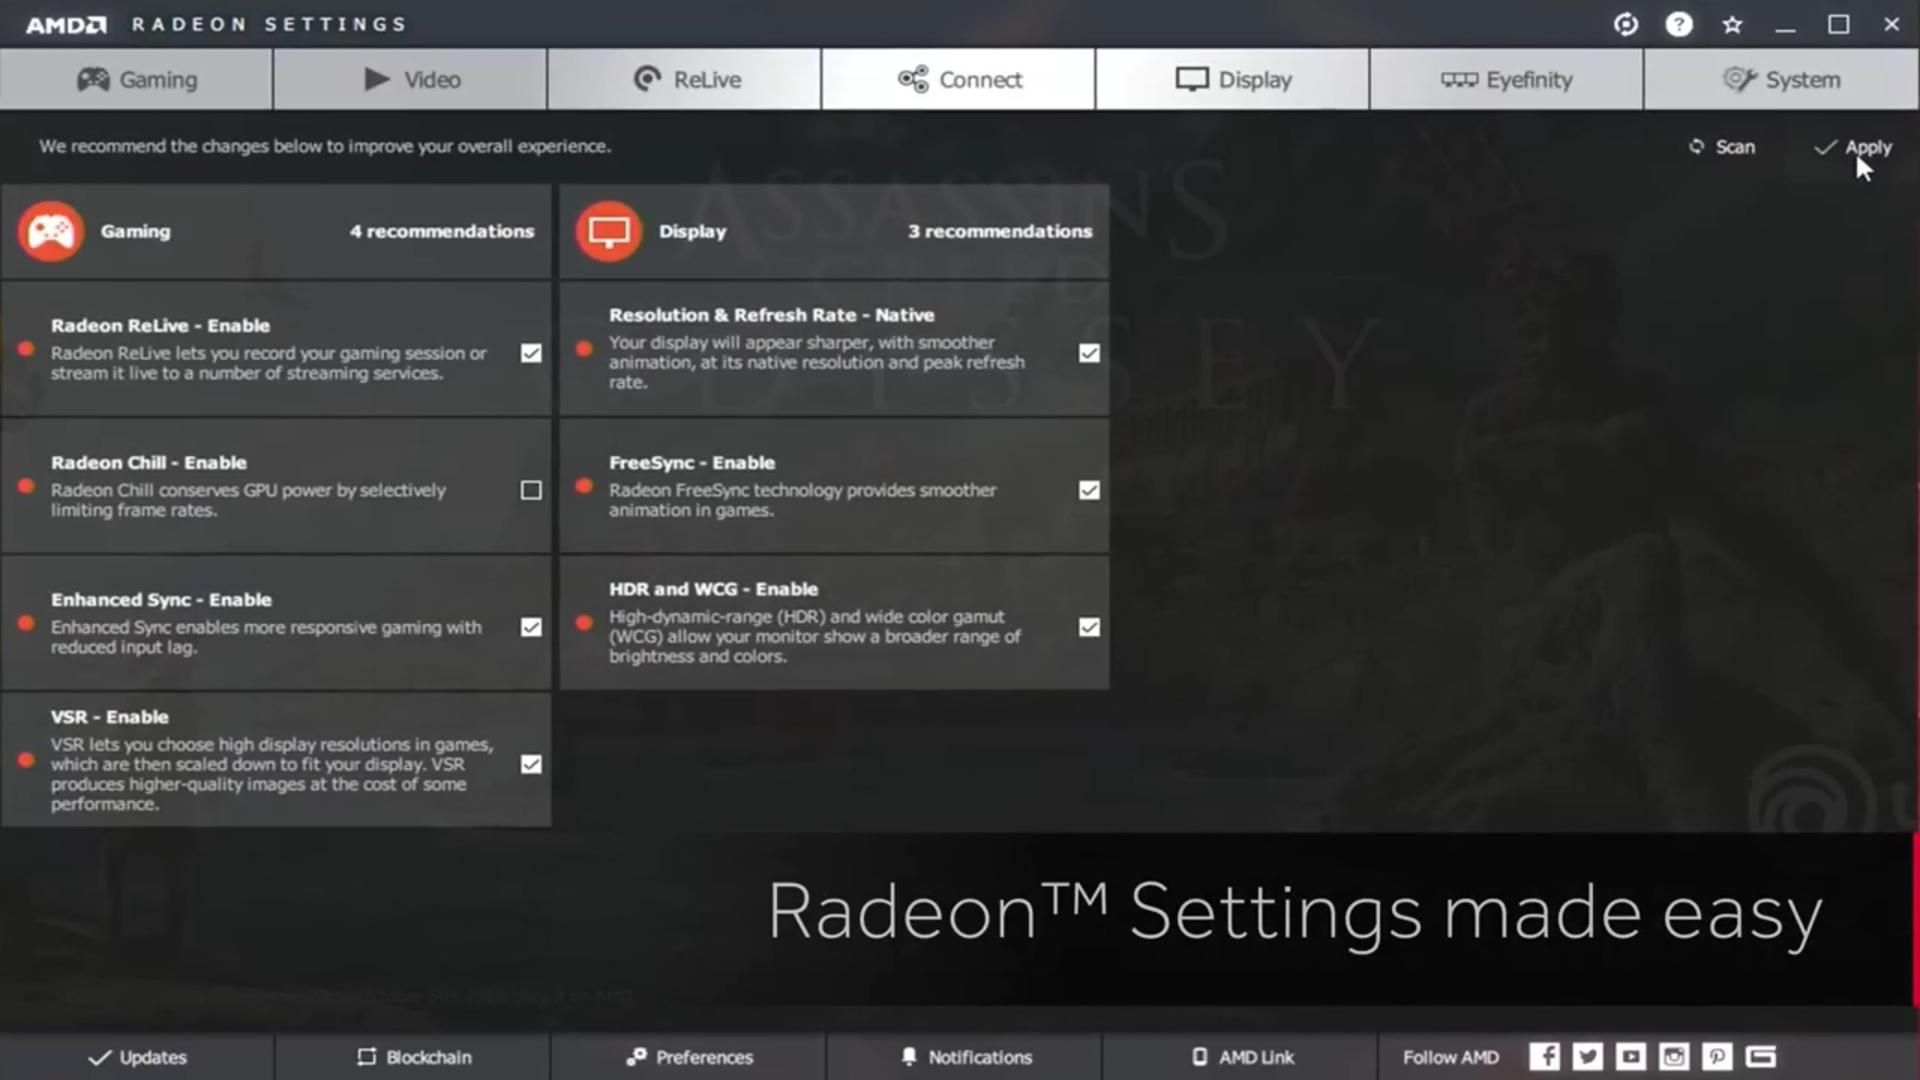 Radeon Software Advisor 2